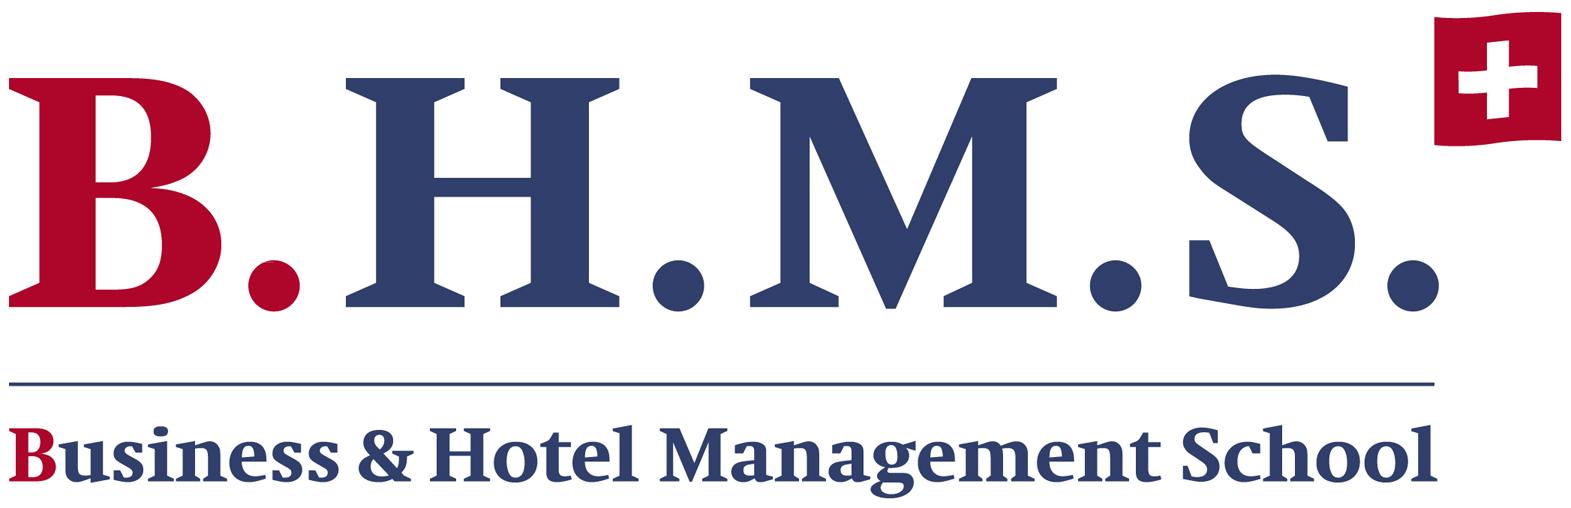 BHMS - Business&Hotel Management School